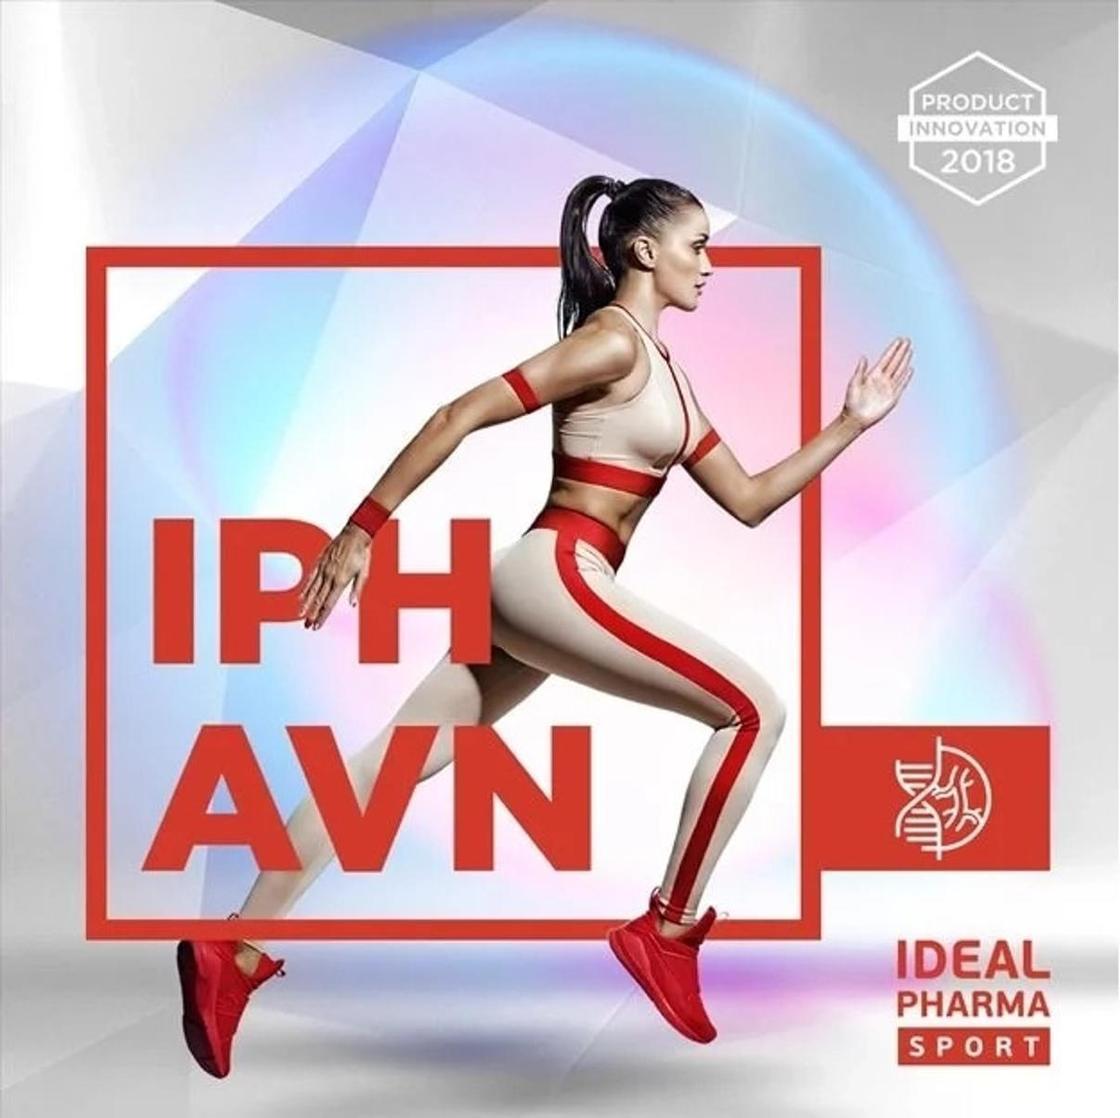 BCAA IPH AEN IPH AVN Ideal Pharma Peptide